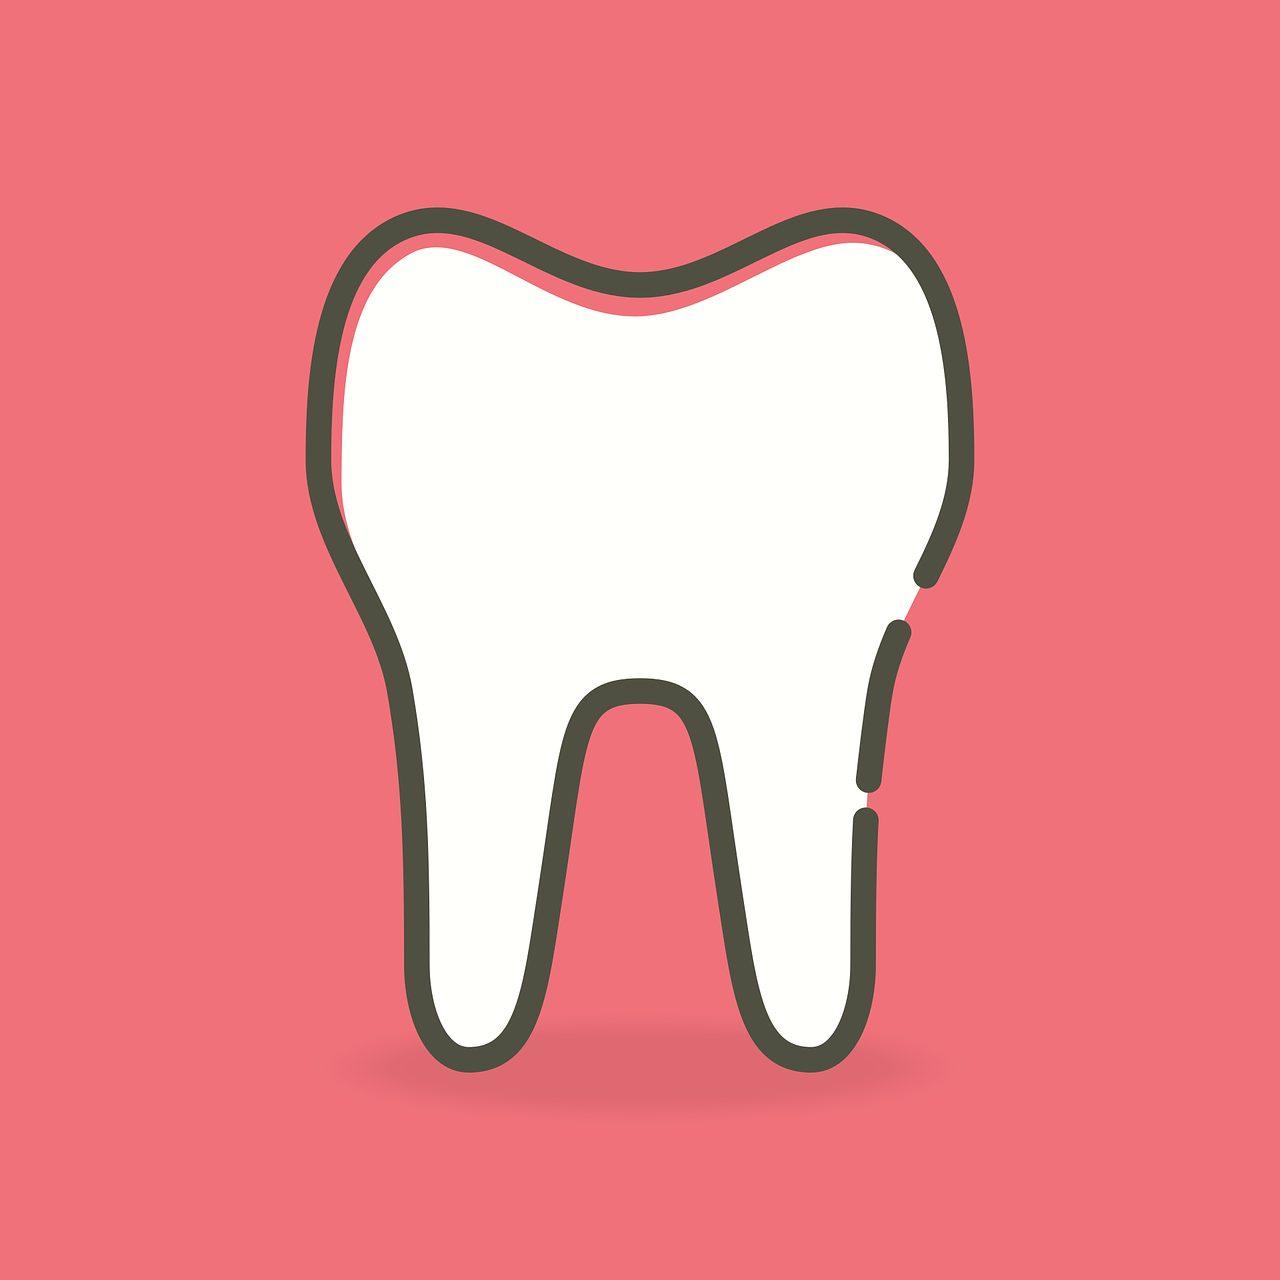 Beest Tandartsenpraktijk F R M van tandarts weekend